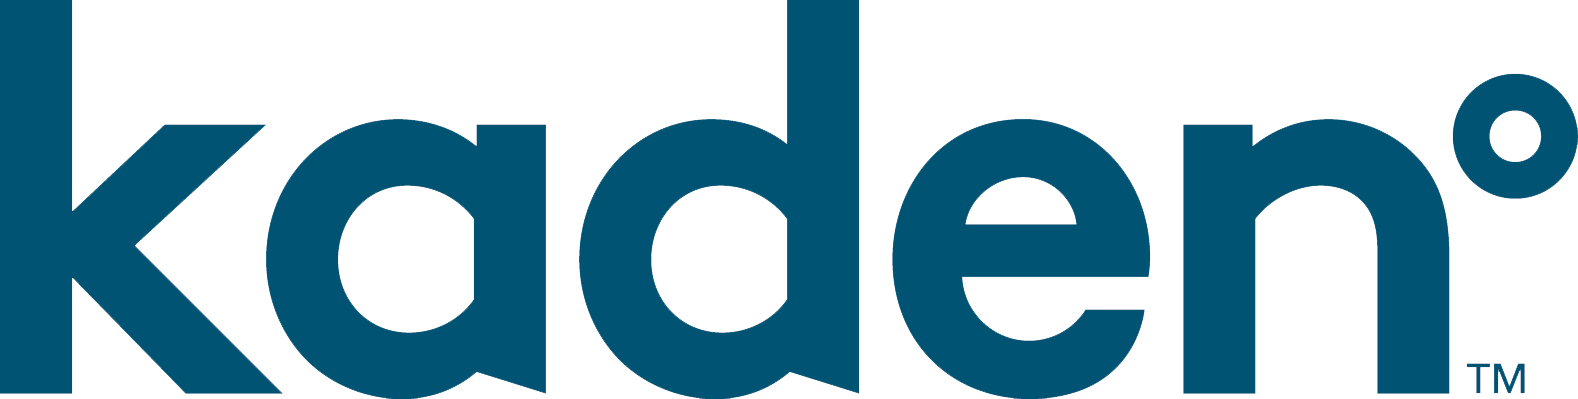 Kaden_logo_PMS